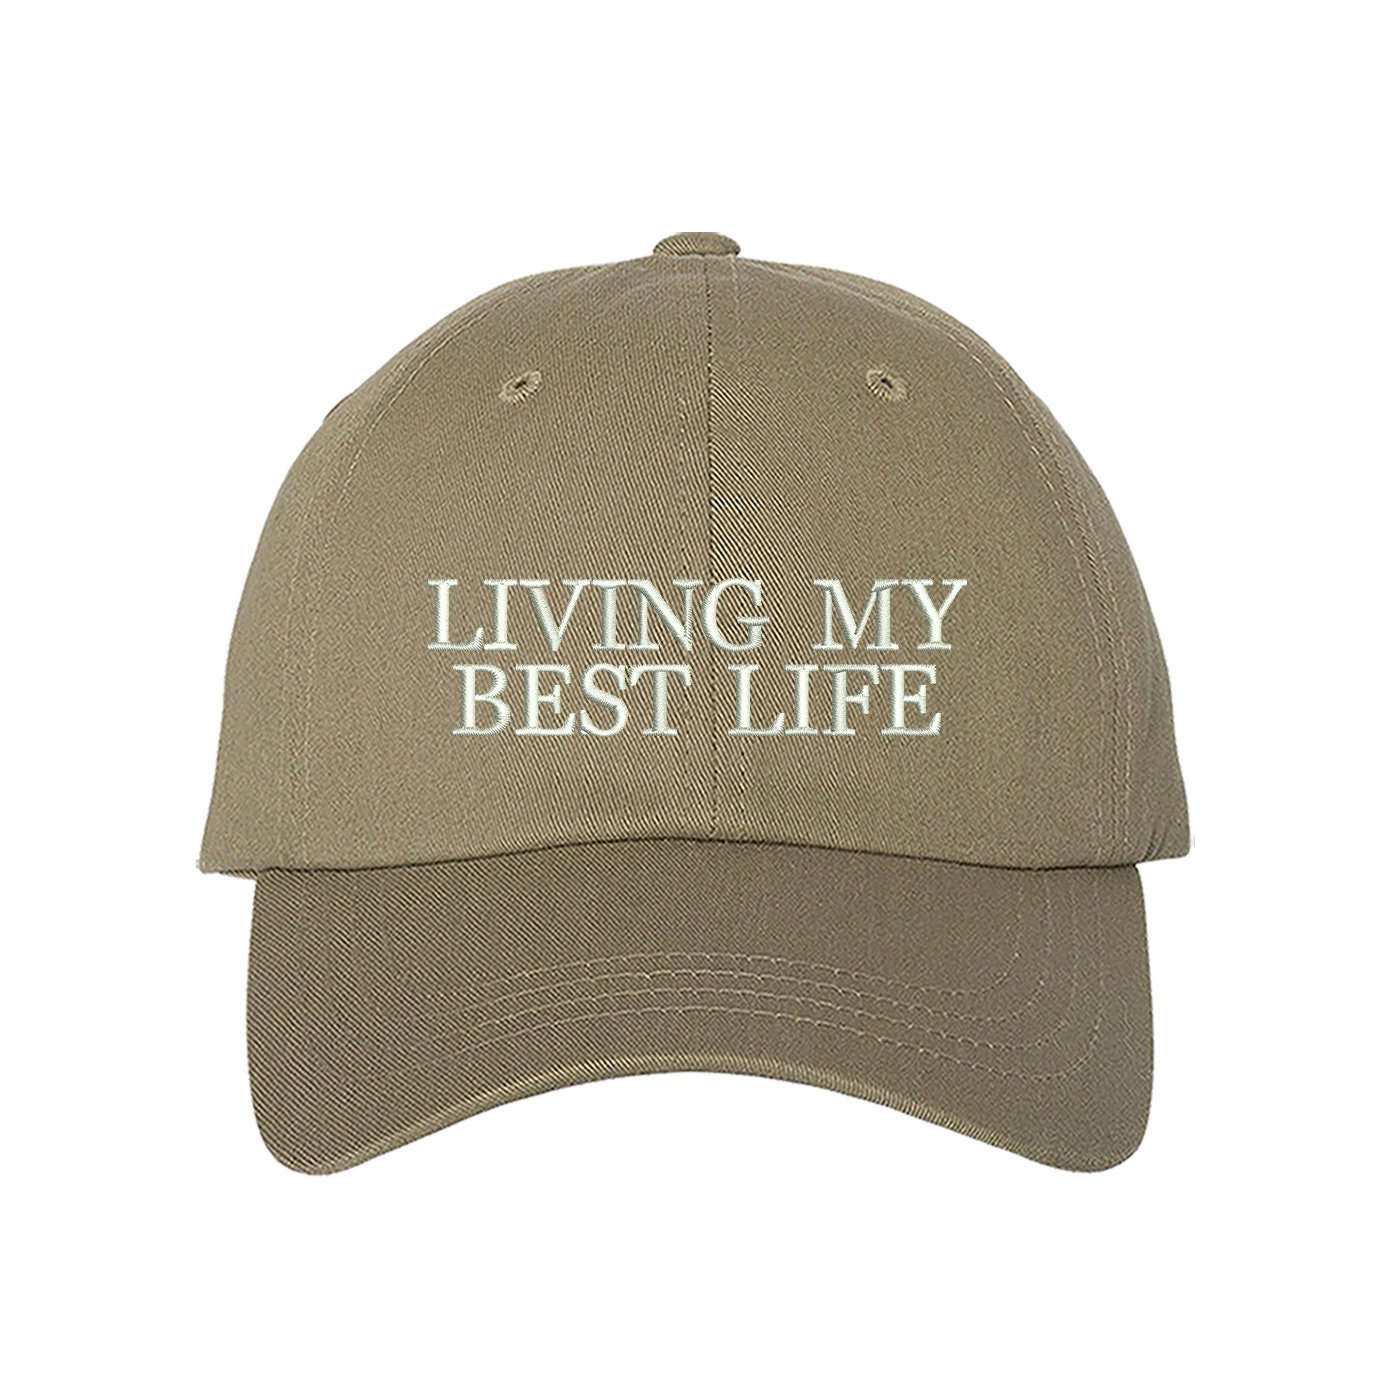 ed82afc239ca5 ... My Best Life Baseball Hat